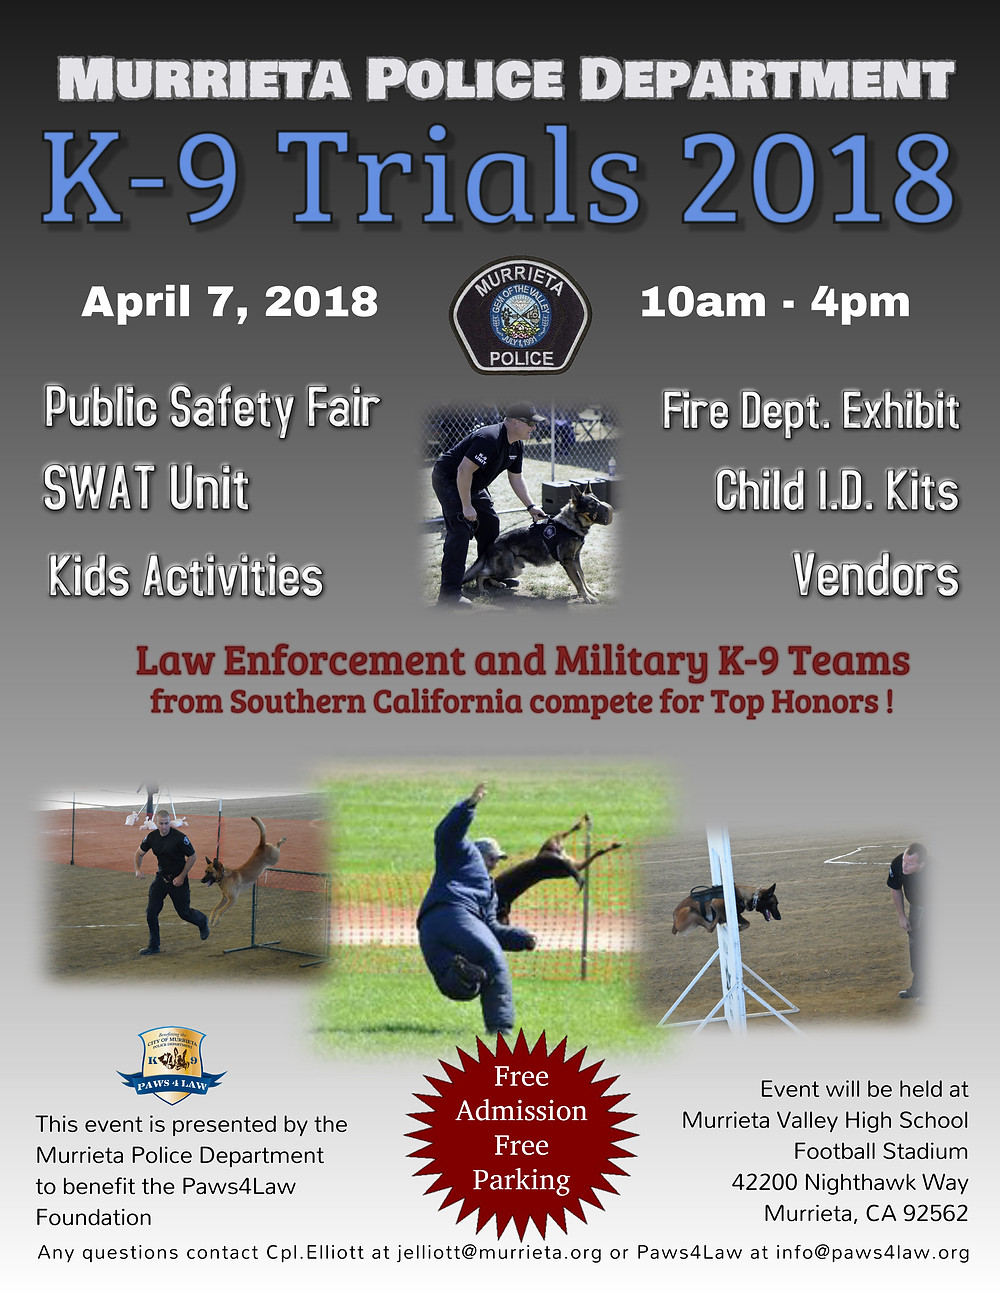 Murrieta Police Department First Annual K-9 Trials APRIL 7 2018